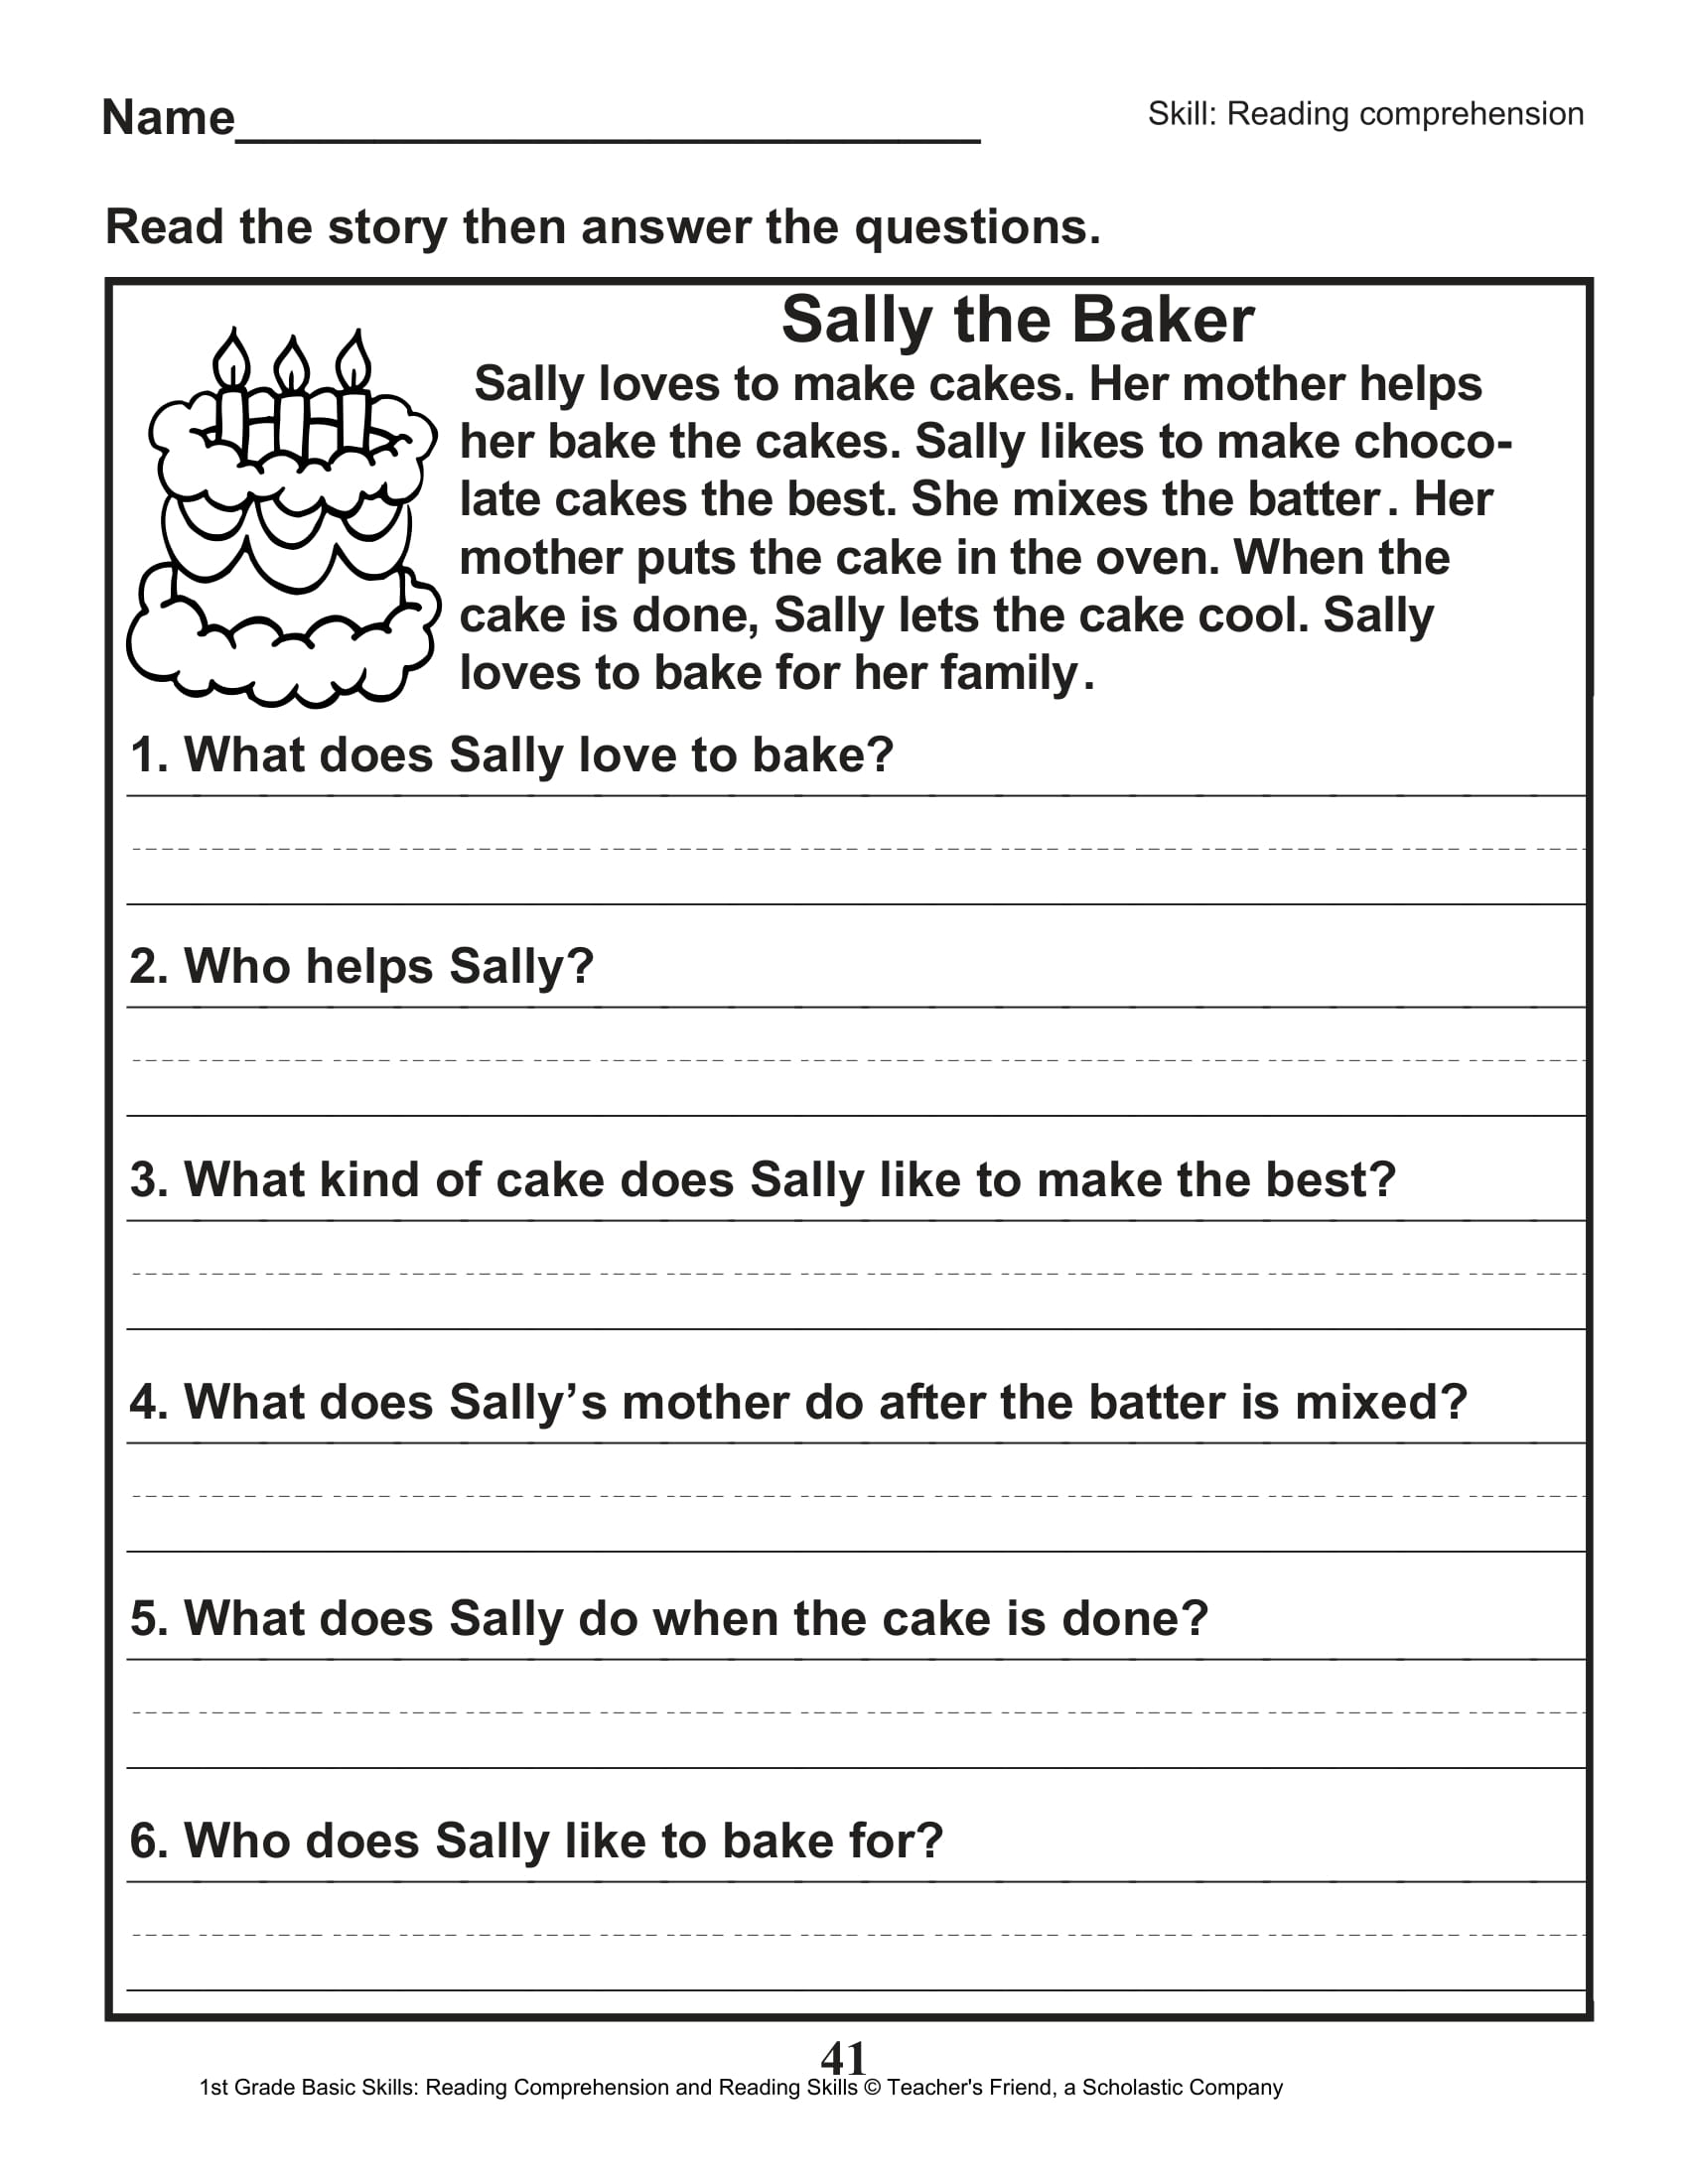 40 Scholastic 1st Grade Reading Comprehension Skills ...